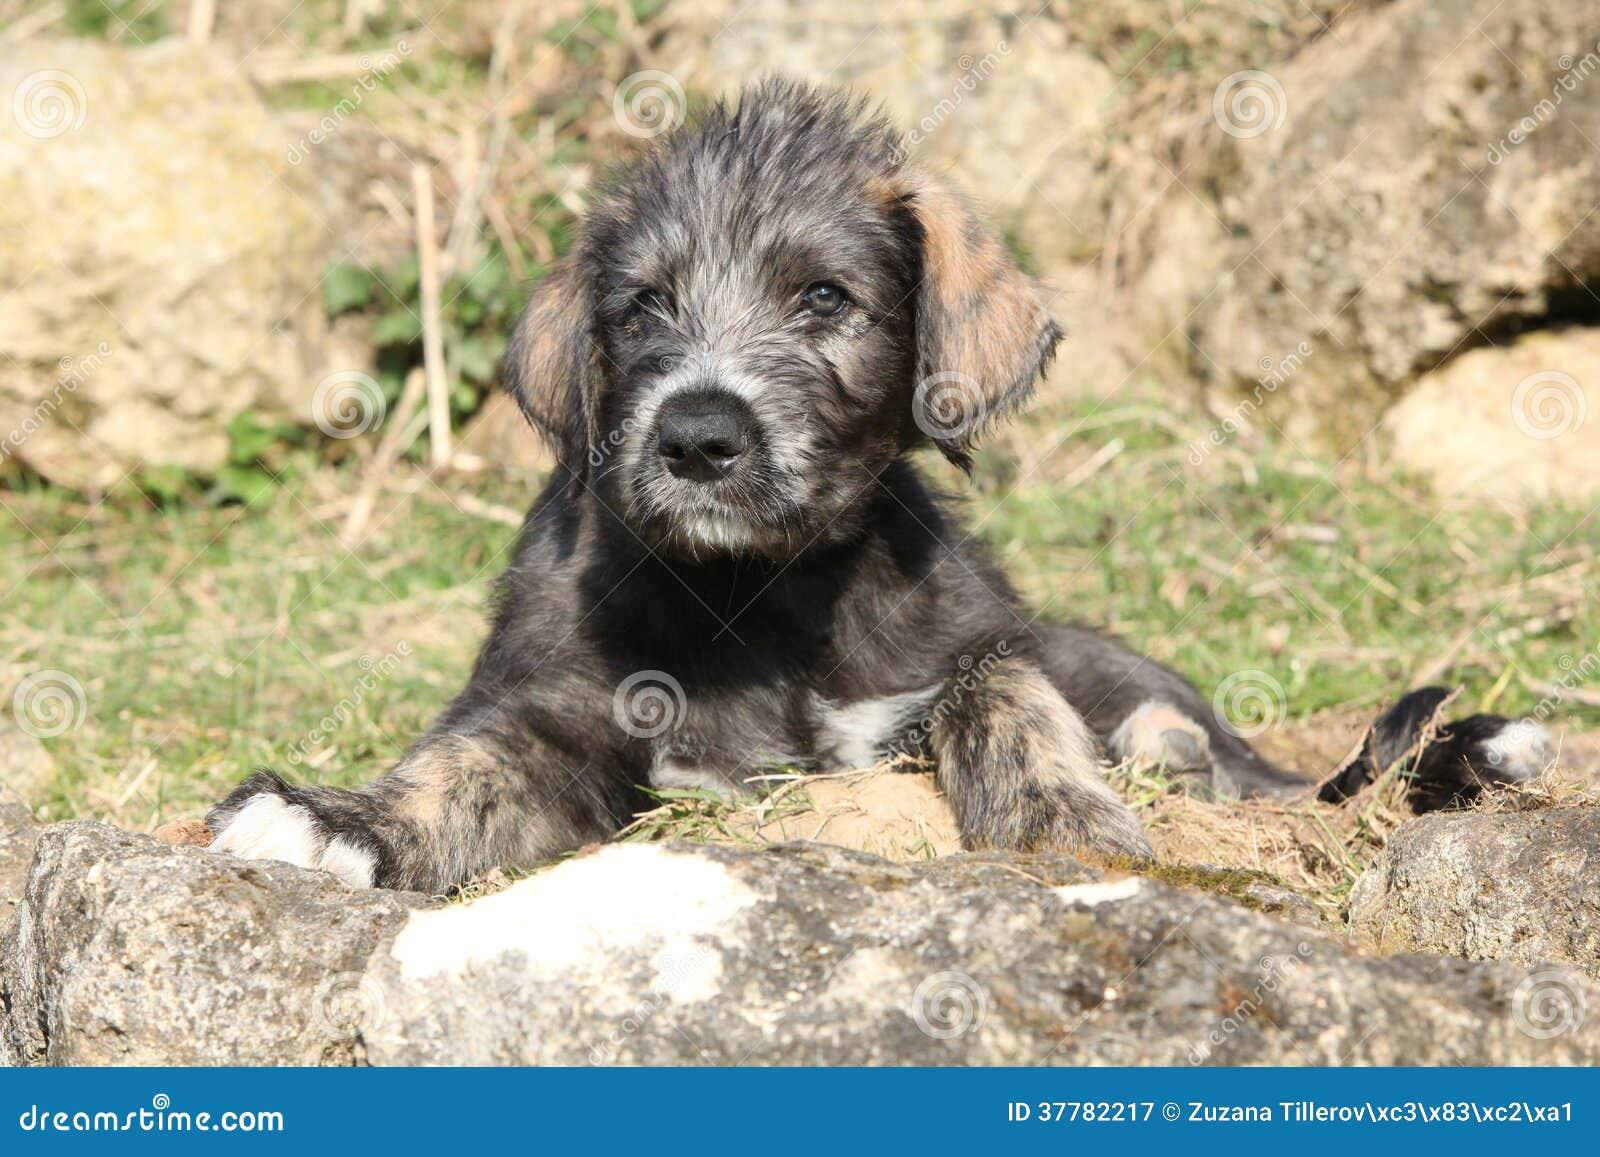 Perrito agradable del perro lobo irland s en el jard n for Ahuyentar perros del jardin